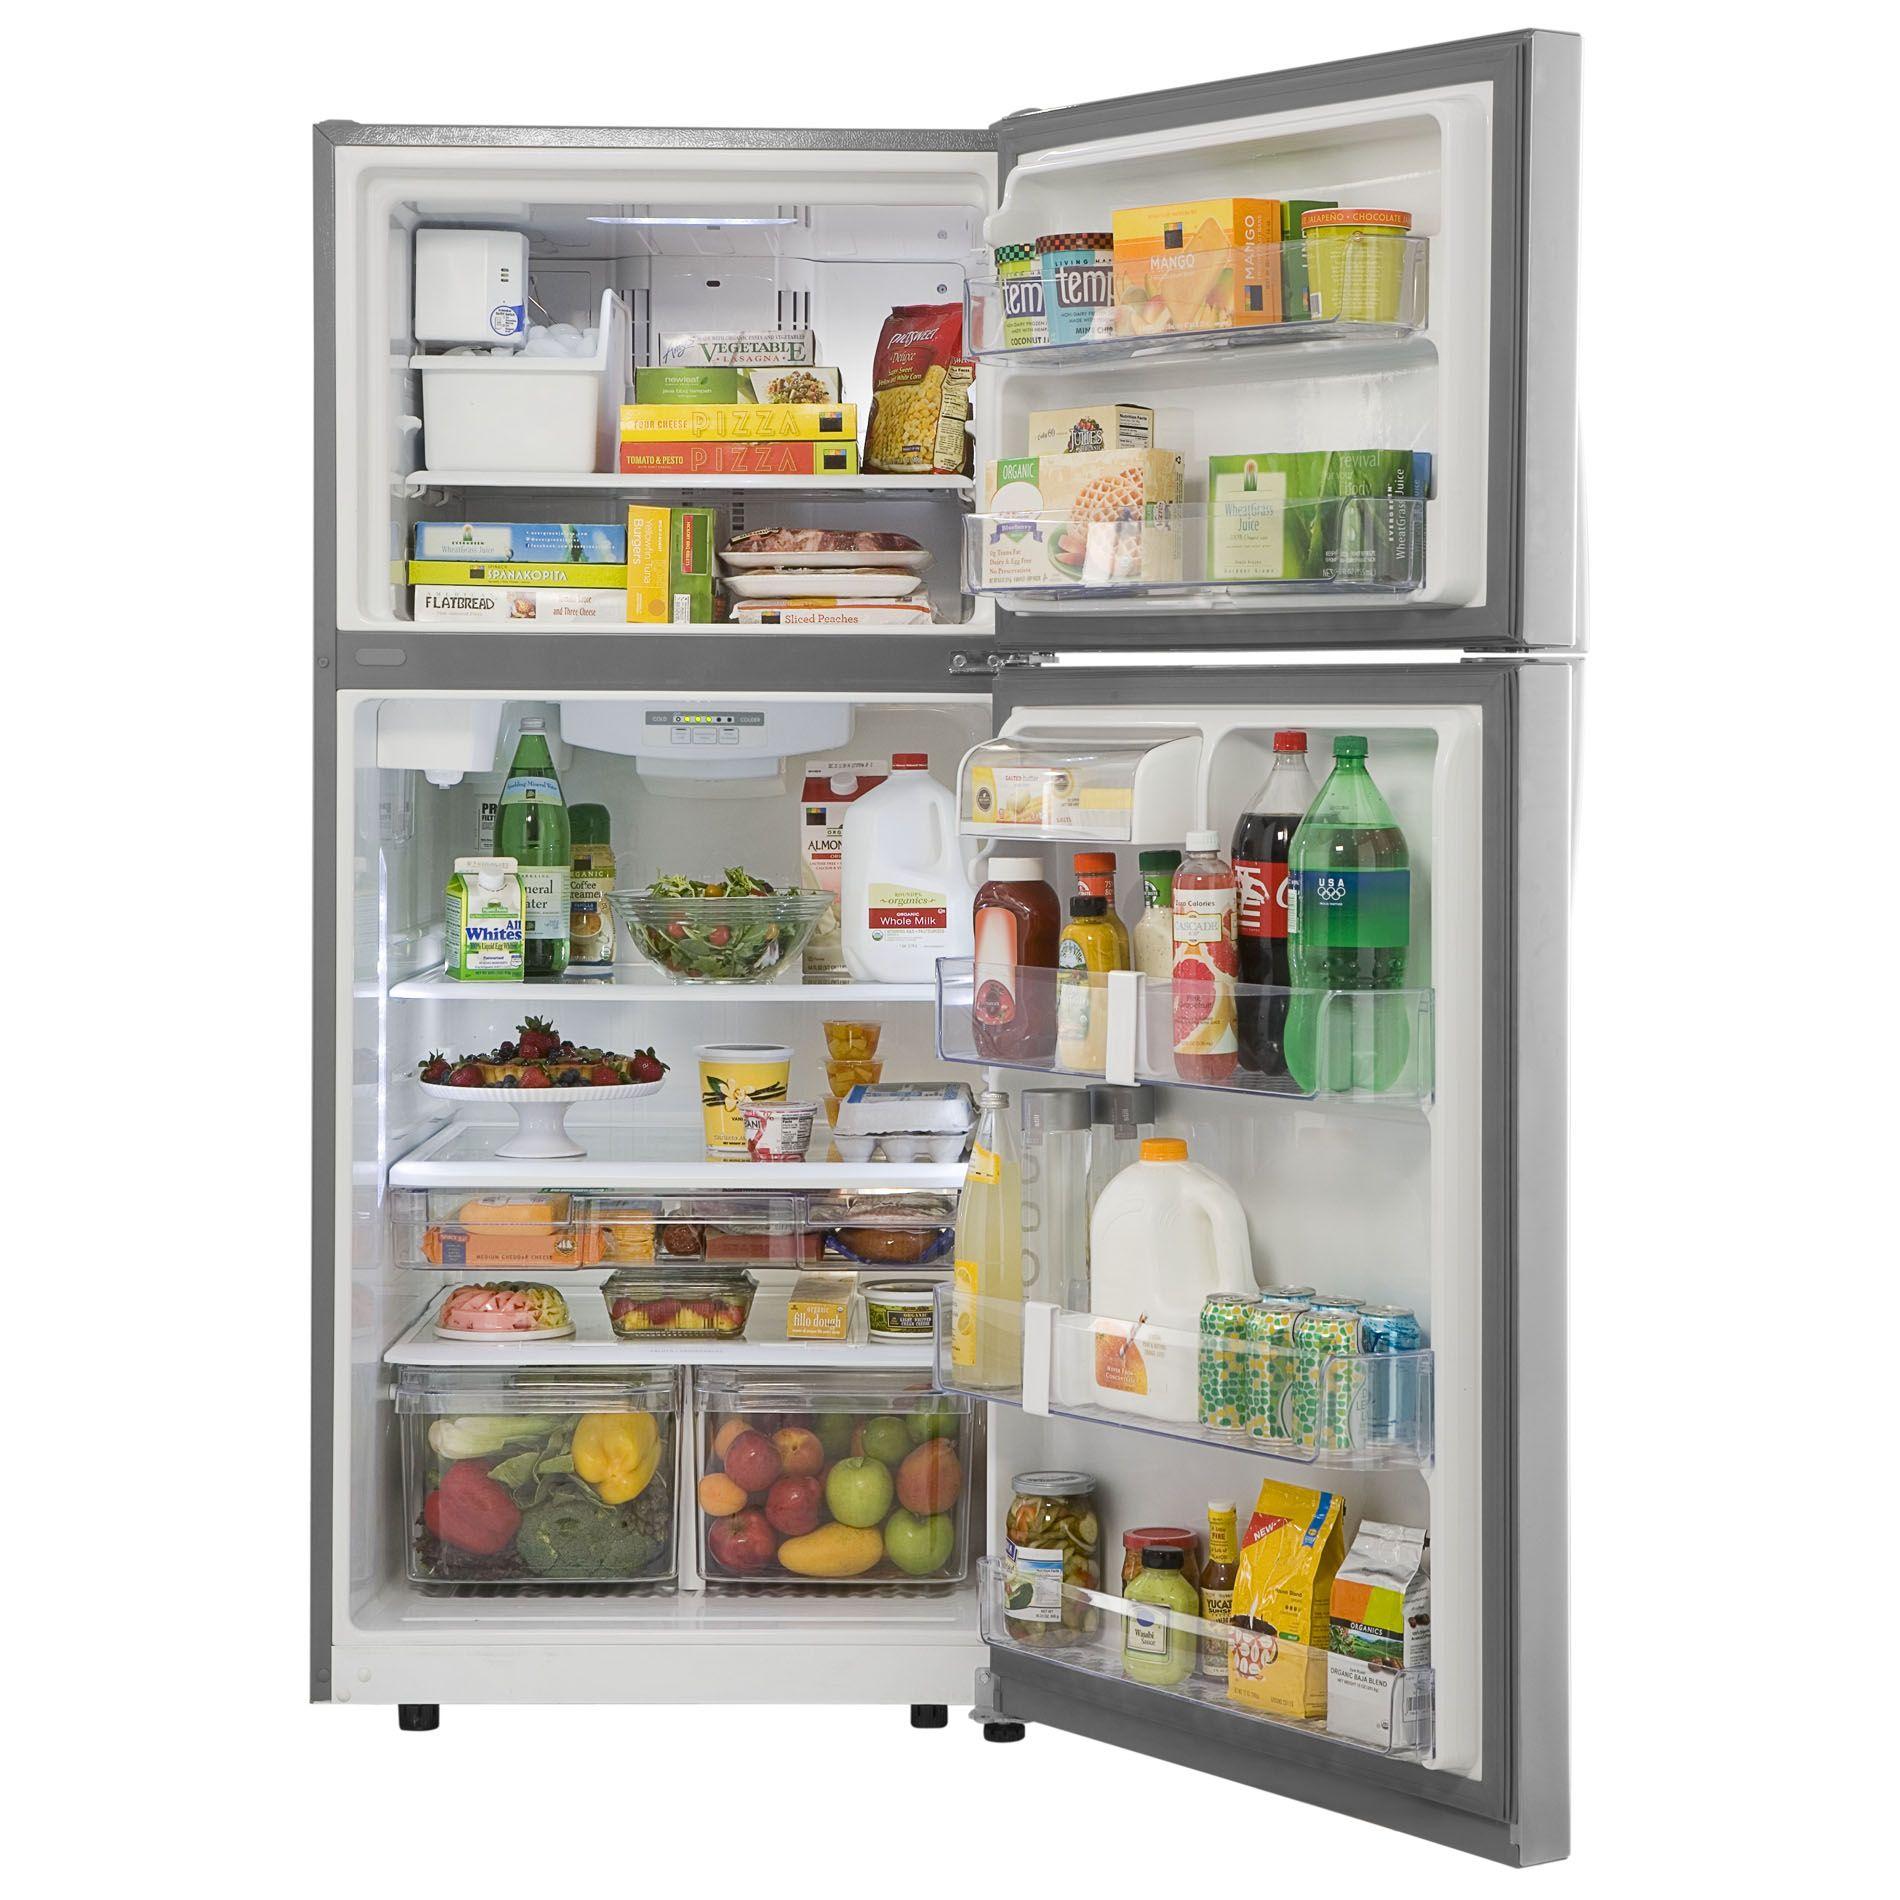 Kenmore 20 cu. ft. Stainless Steel Top-Freezer Refrigerator with Internal Water Dispenser